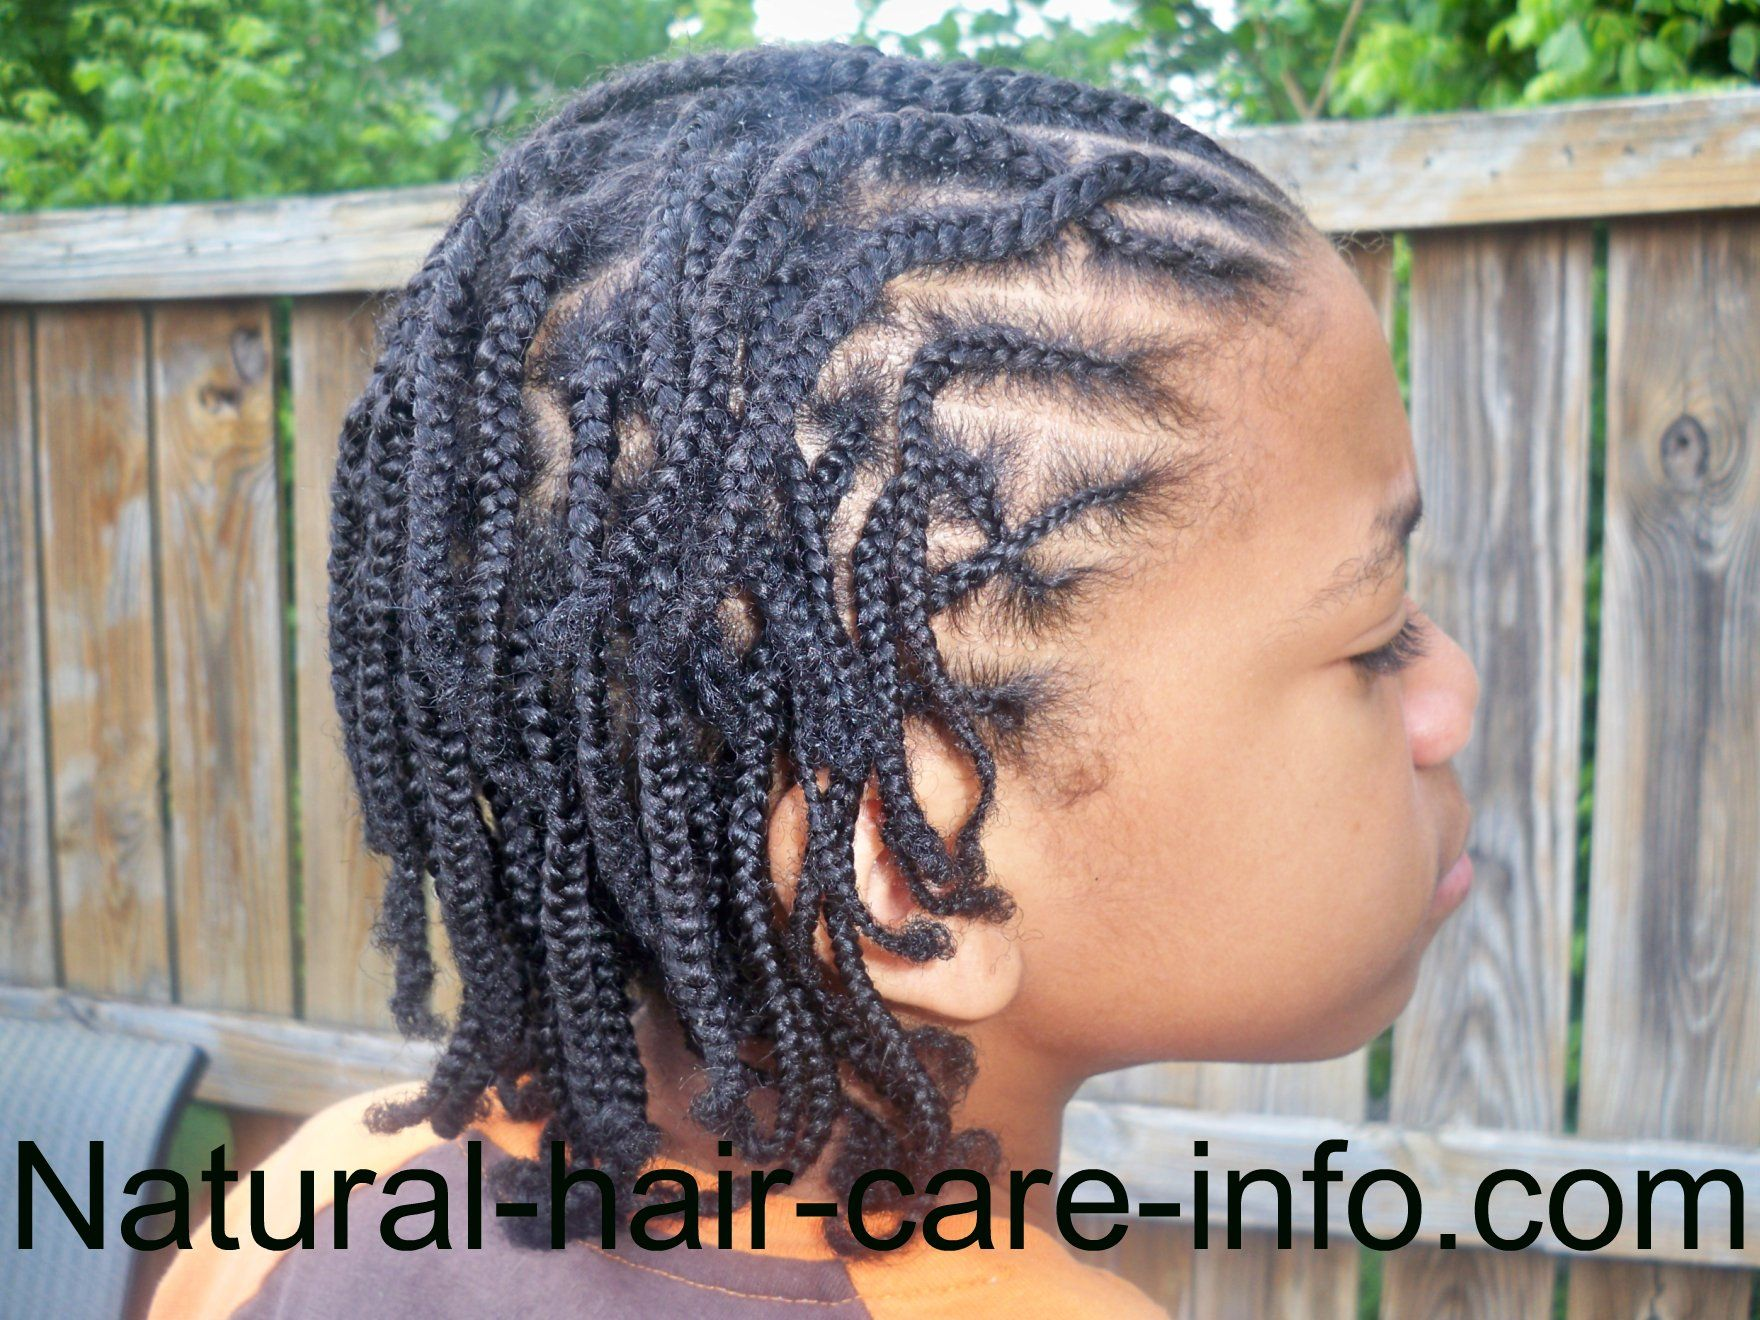 Black Mens Hairstyles Braids For Men Cornrow Designs Natural - Boy hairstyle braids